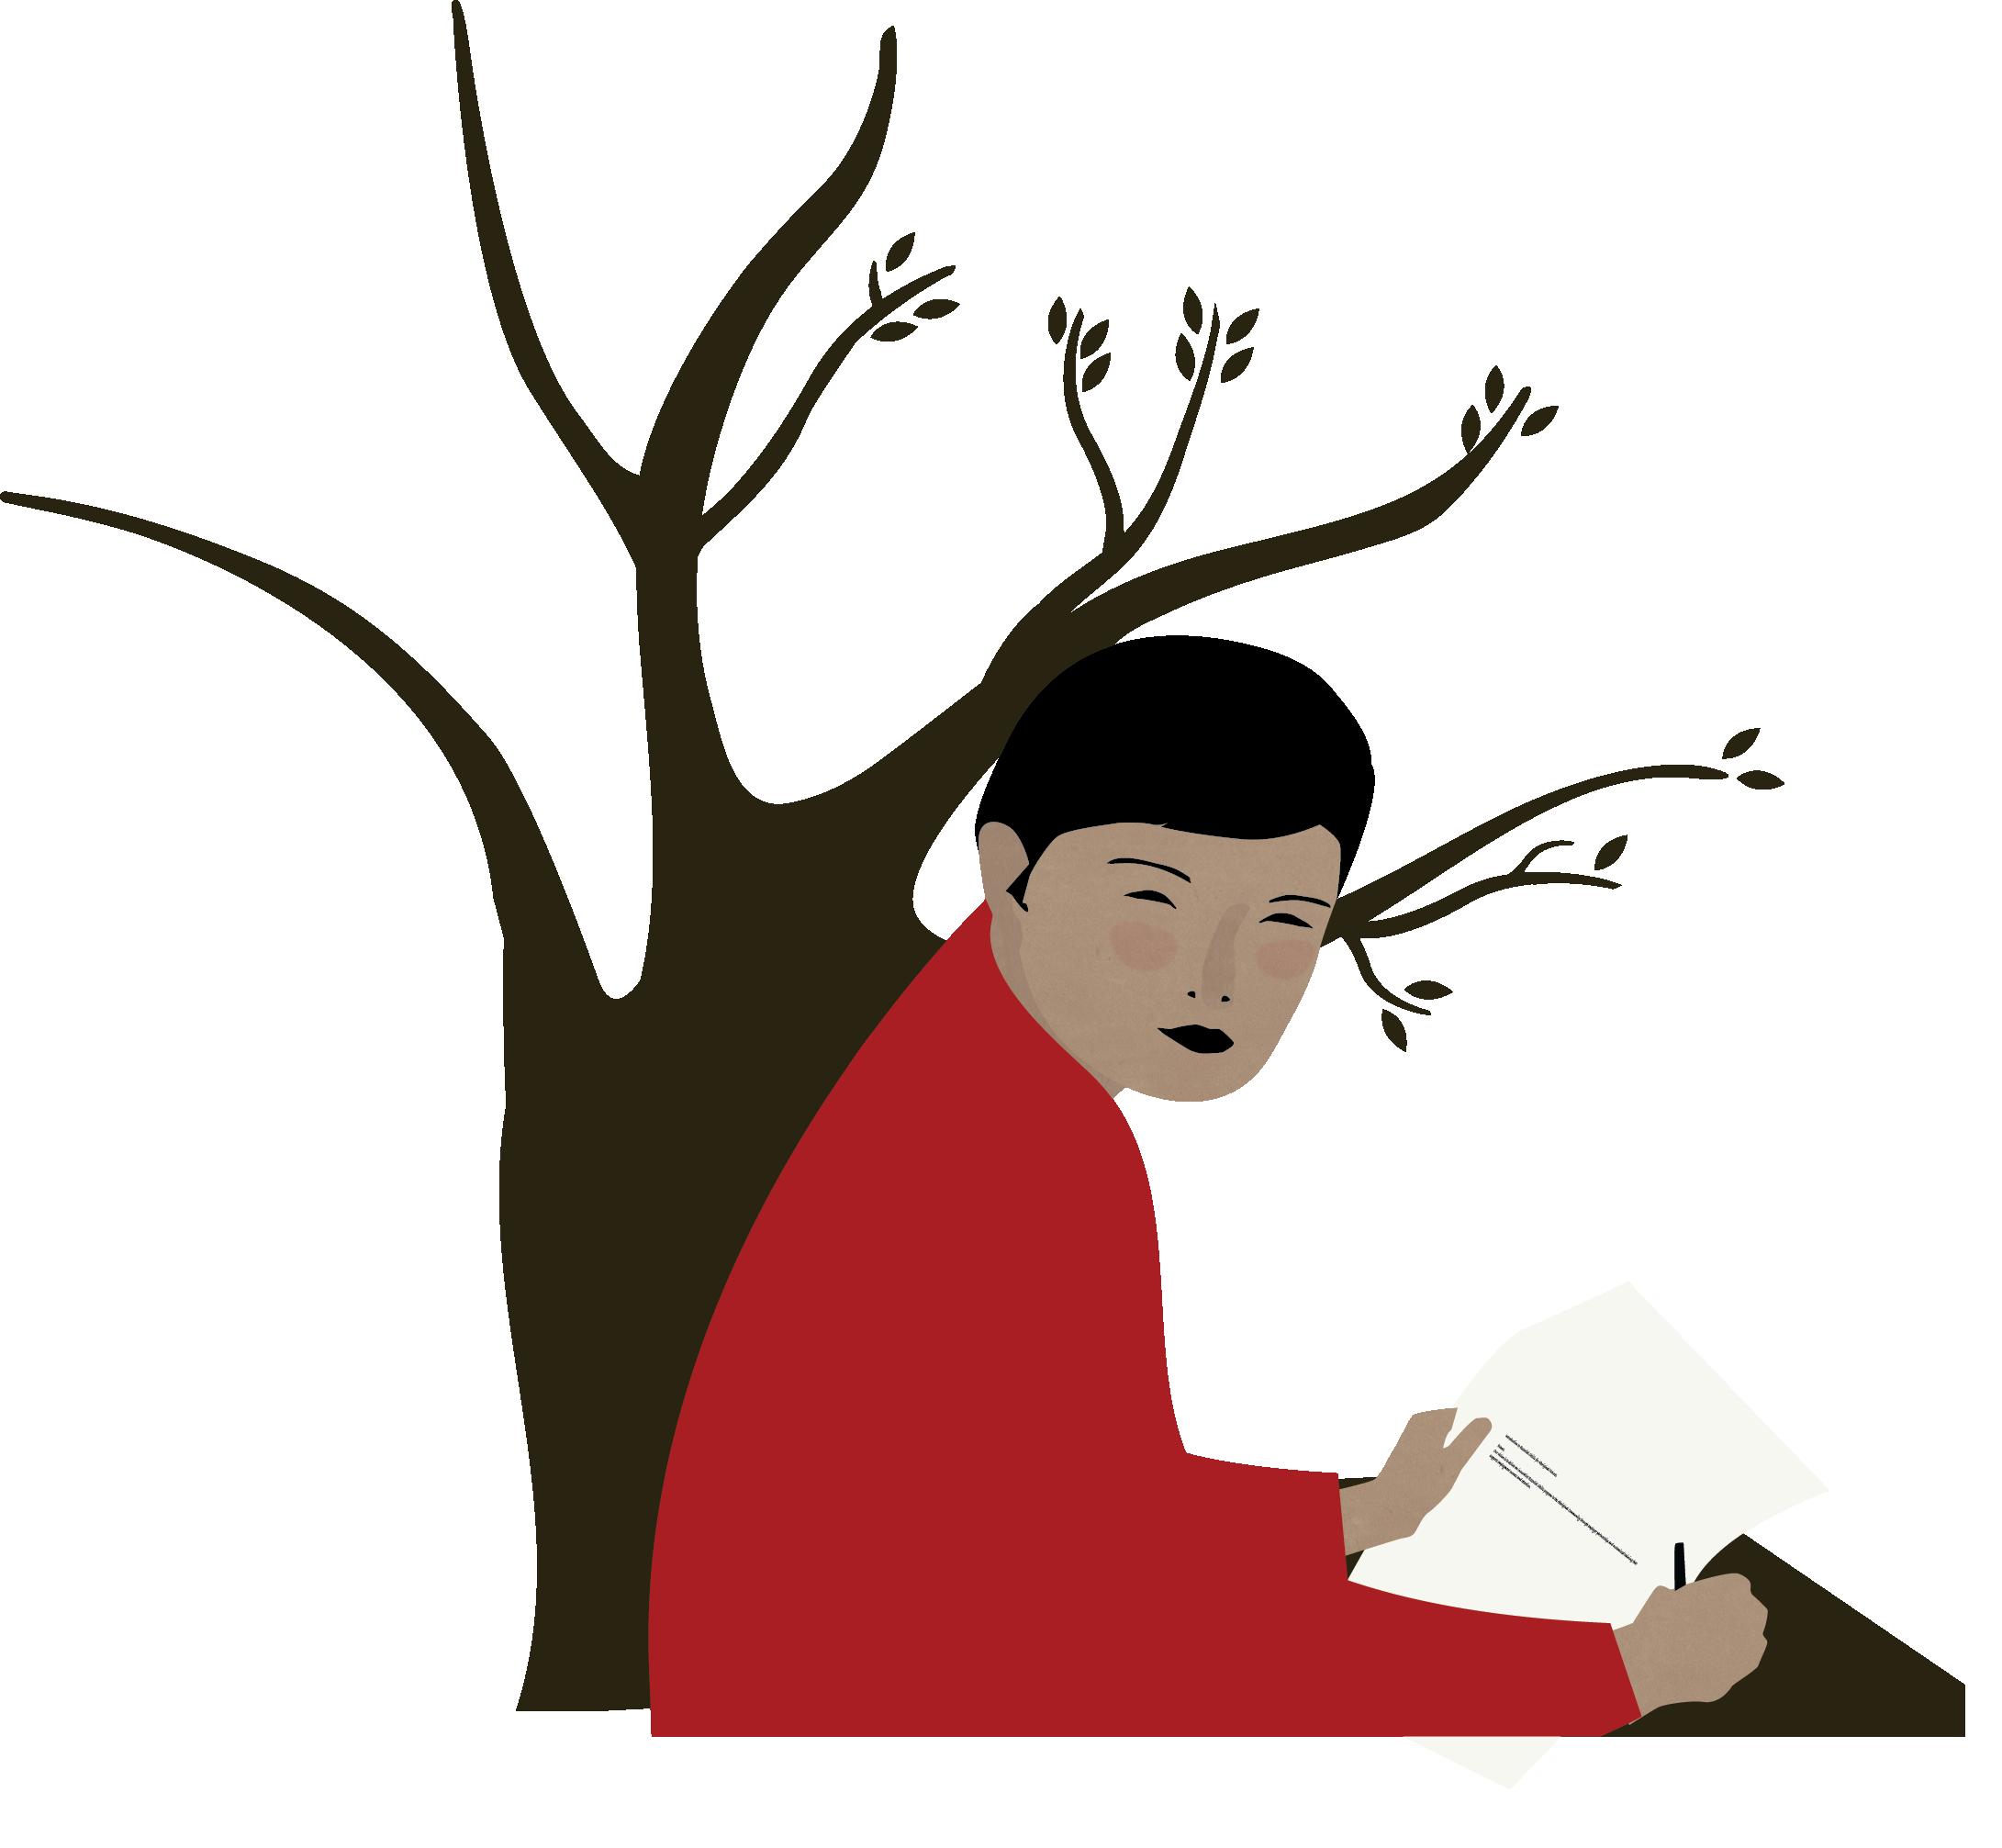 Essential writing aboriginal skills. Knowledge clipart fundamental skill